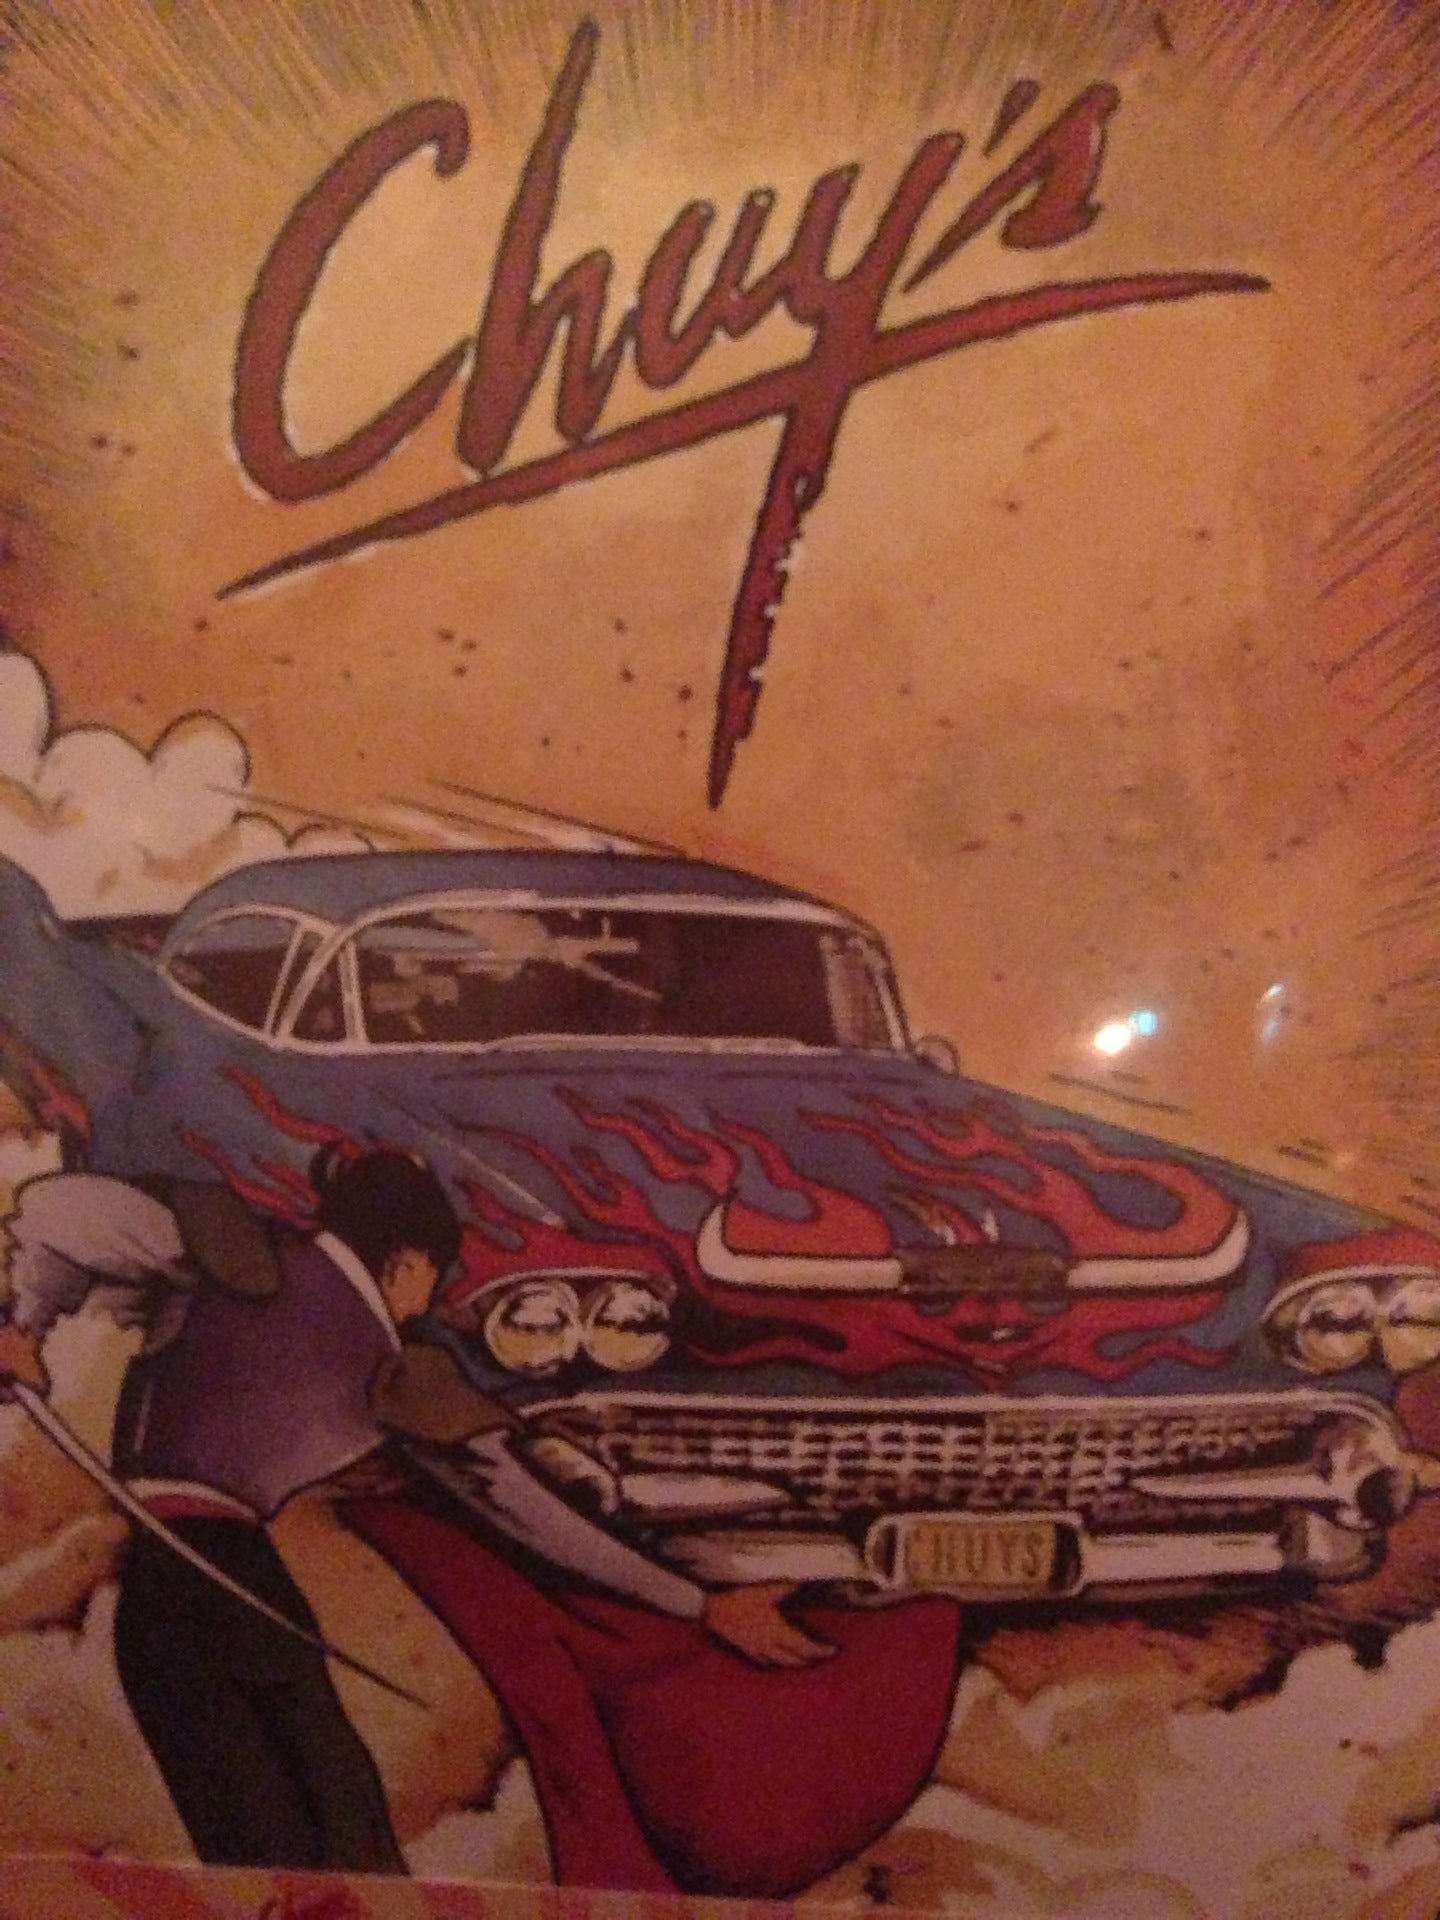 Chuy's,